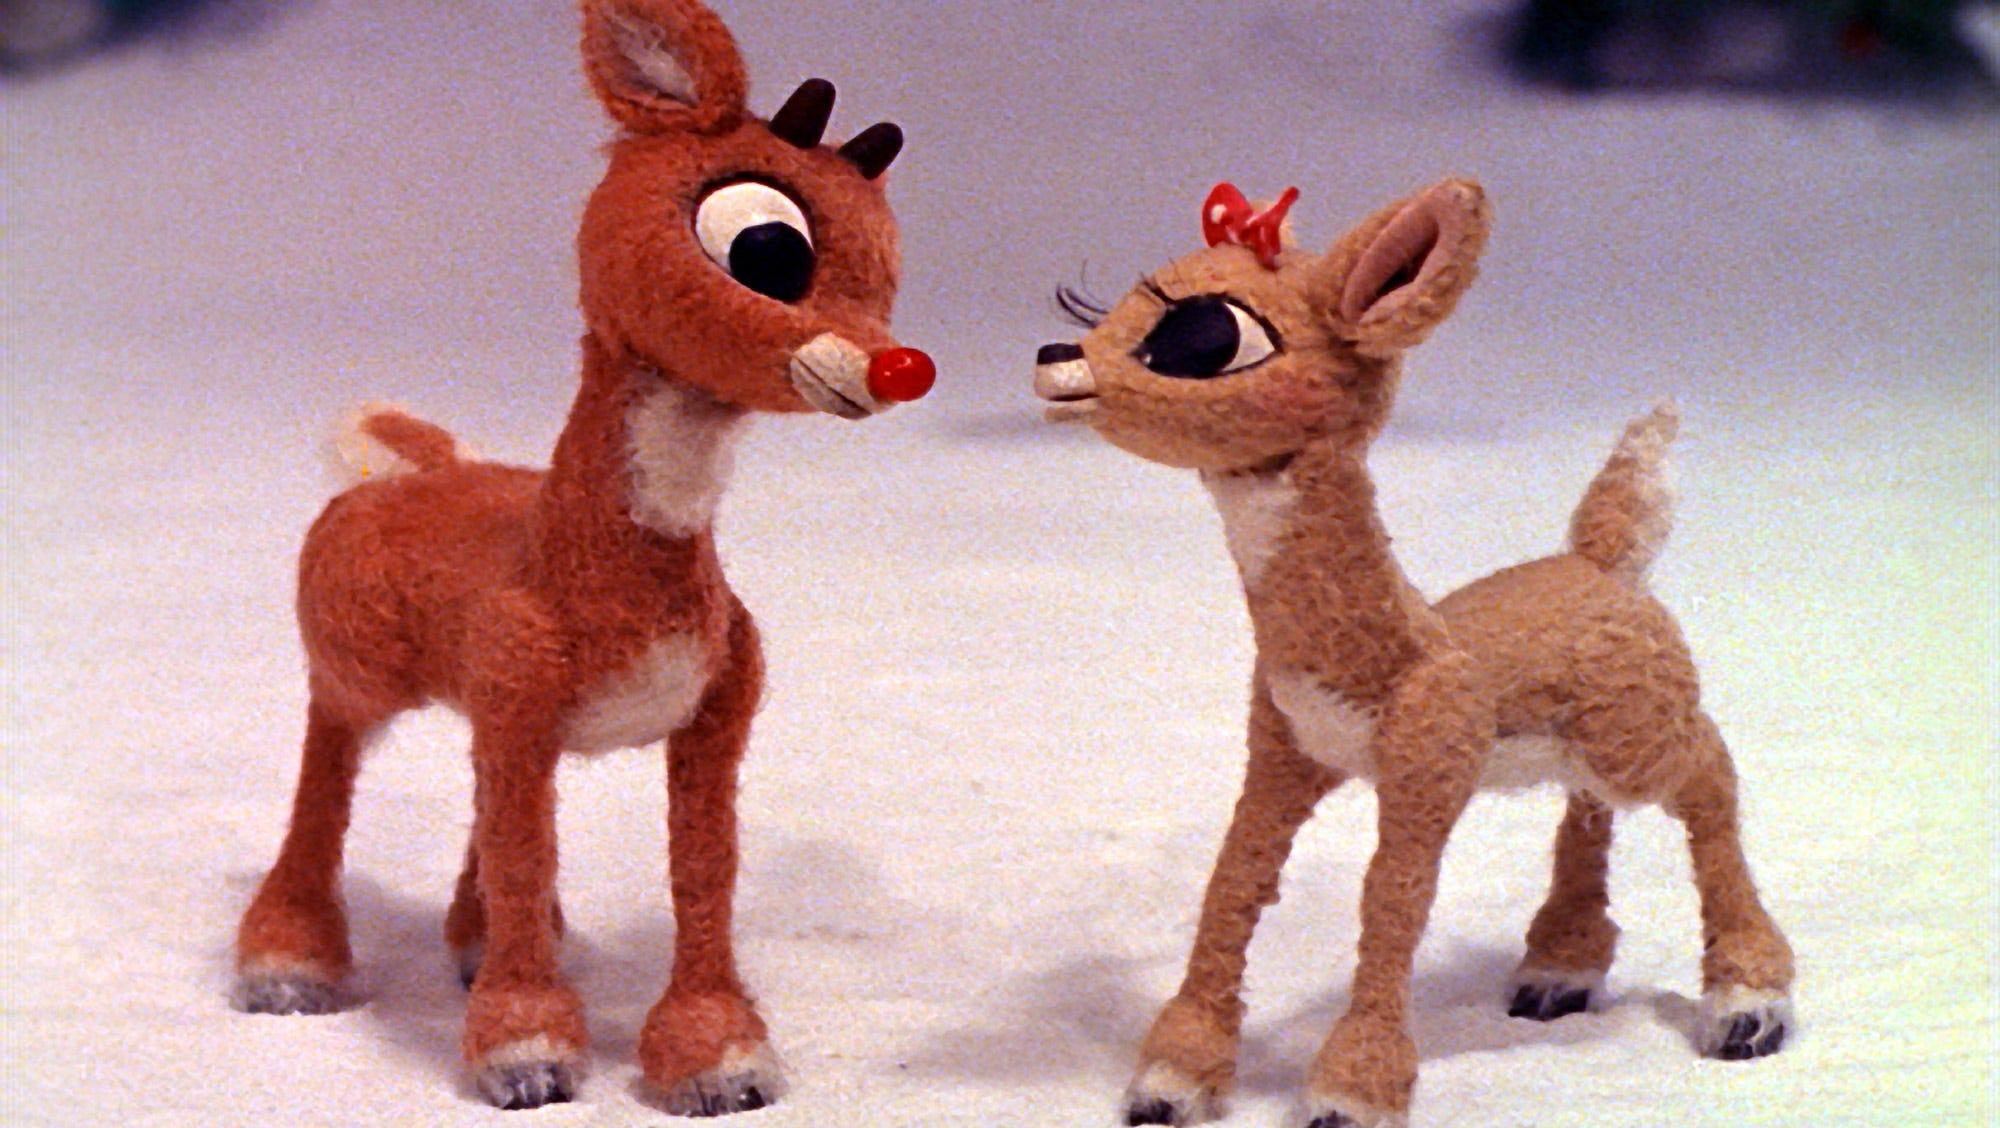 Best Yukon Cornelius Quotes From Rudolph